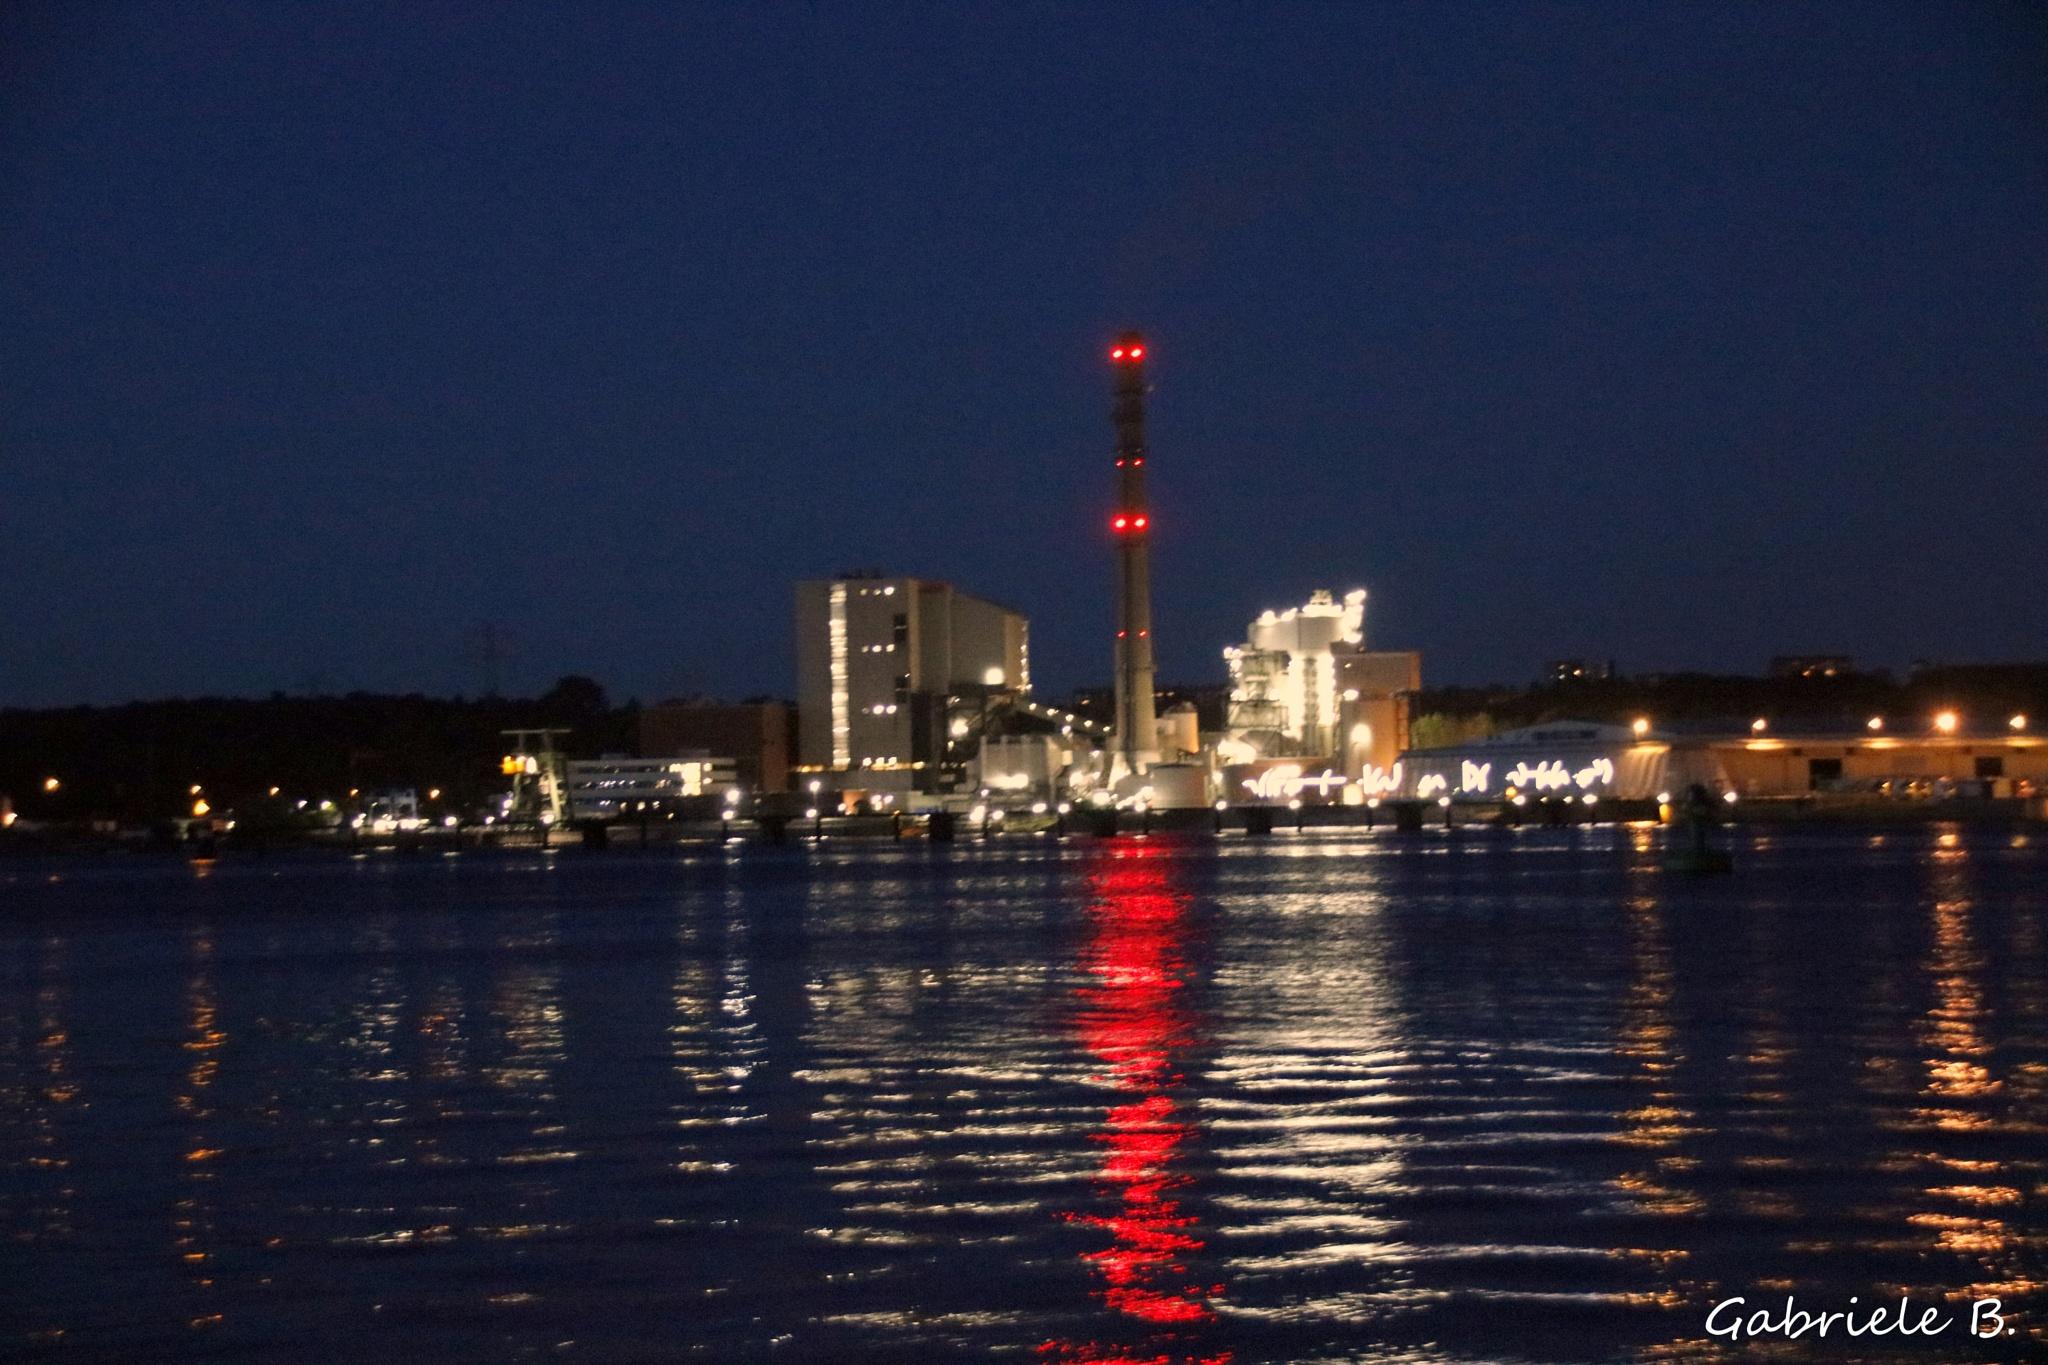 Coal power station  Port of Kiel by gabrielehelenebittner